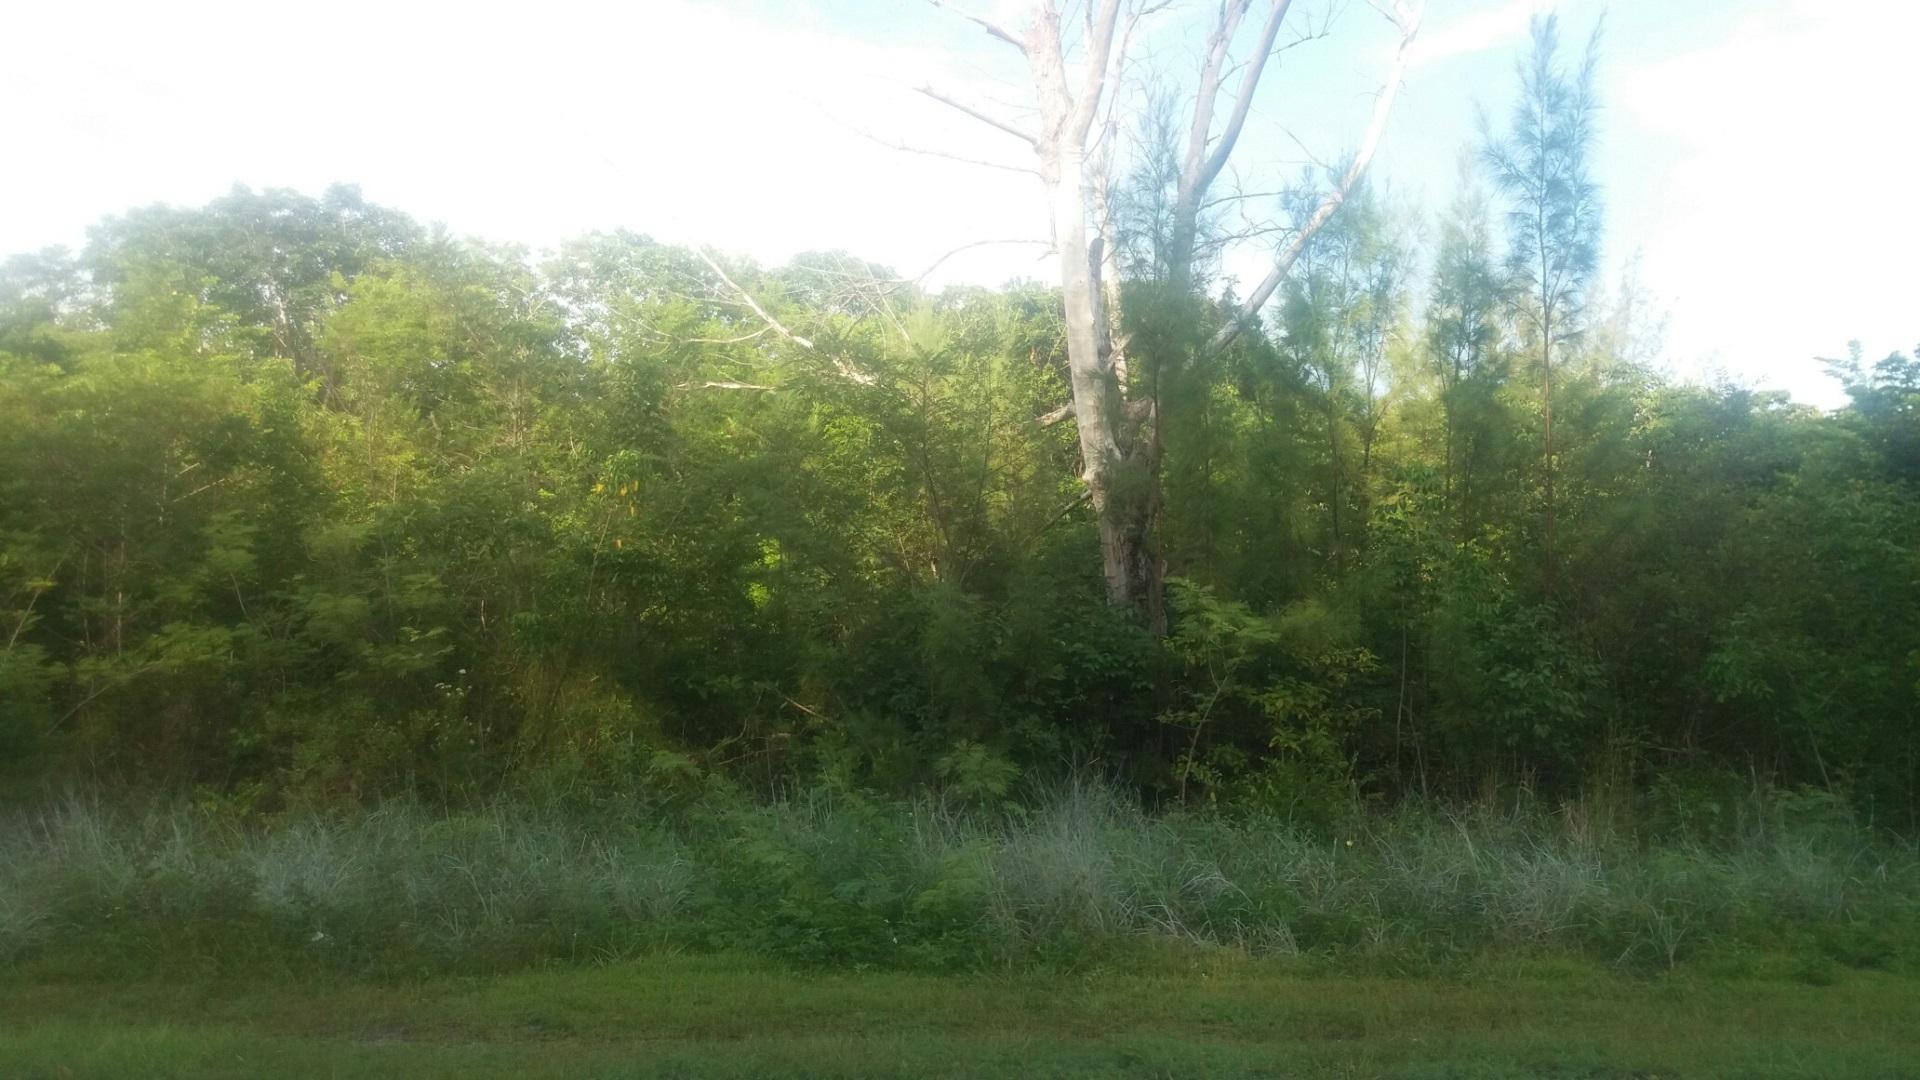 Land for Sale at Great Deal in Emerald Bay - MLS 27802 Emerald Bay, Grand Bahama, Bahamas